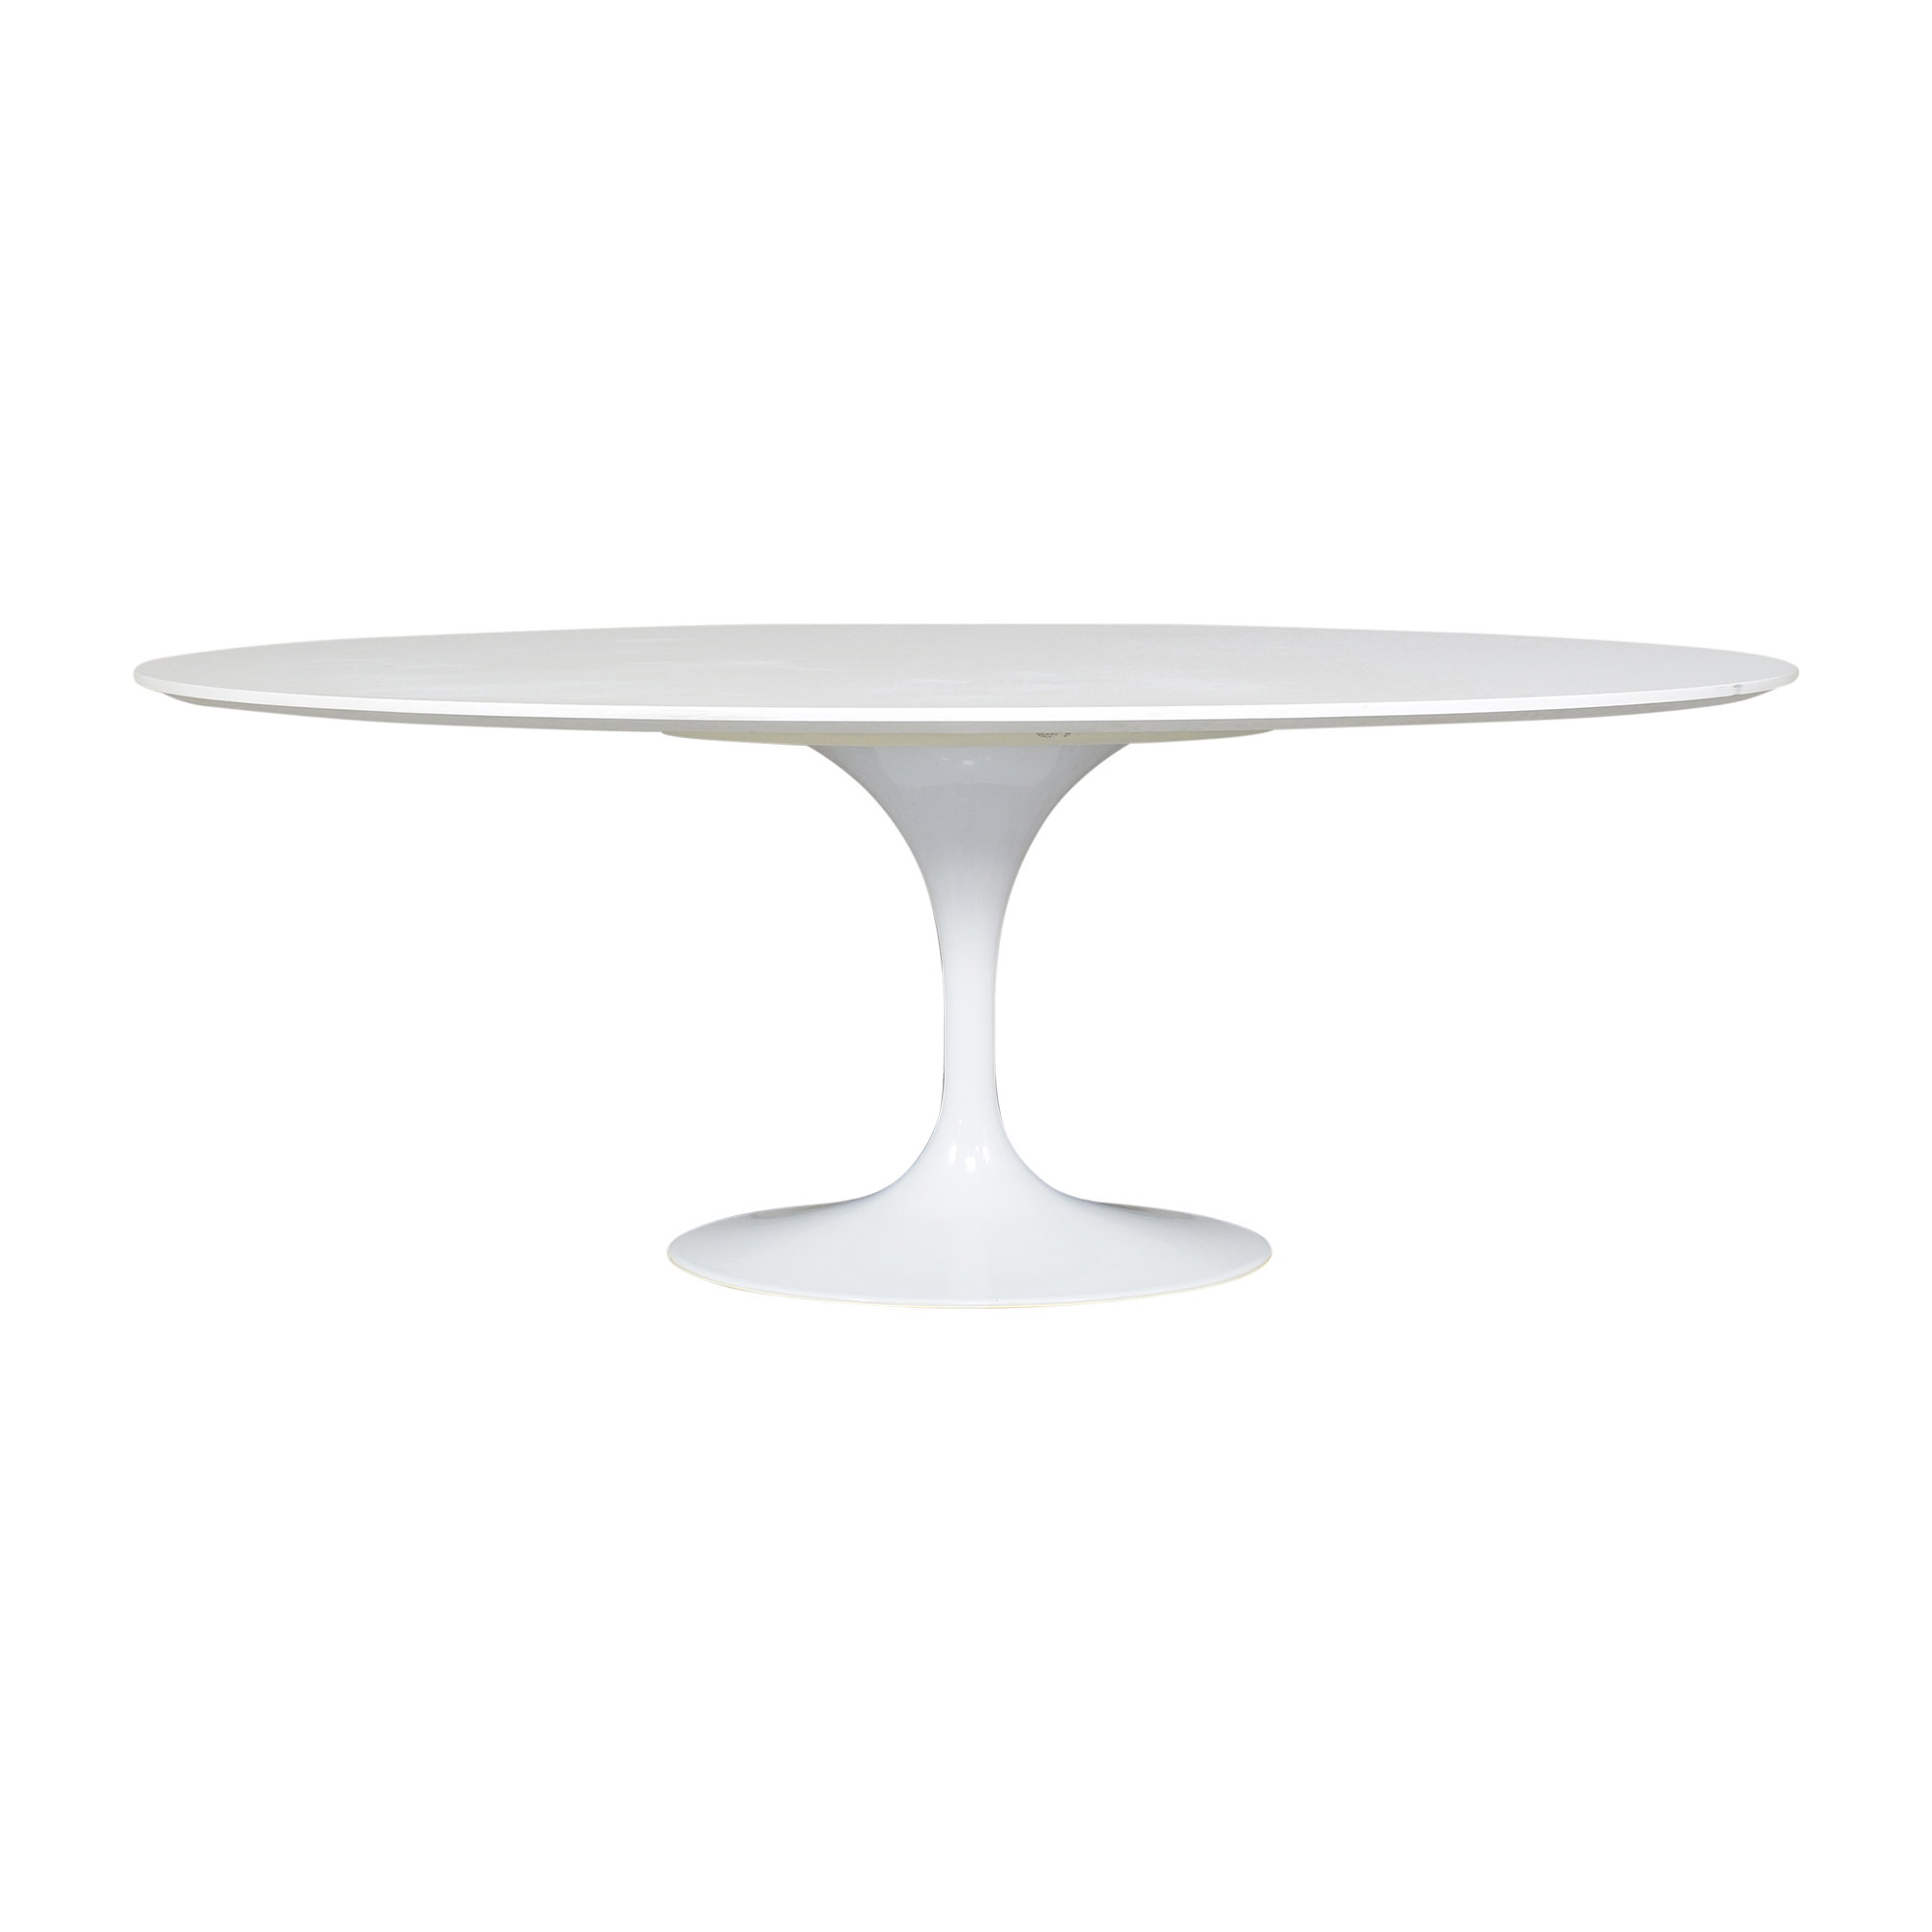 Wayfair Wayfair Wade Logan Bartsch Pedestal Dining Table white